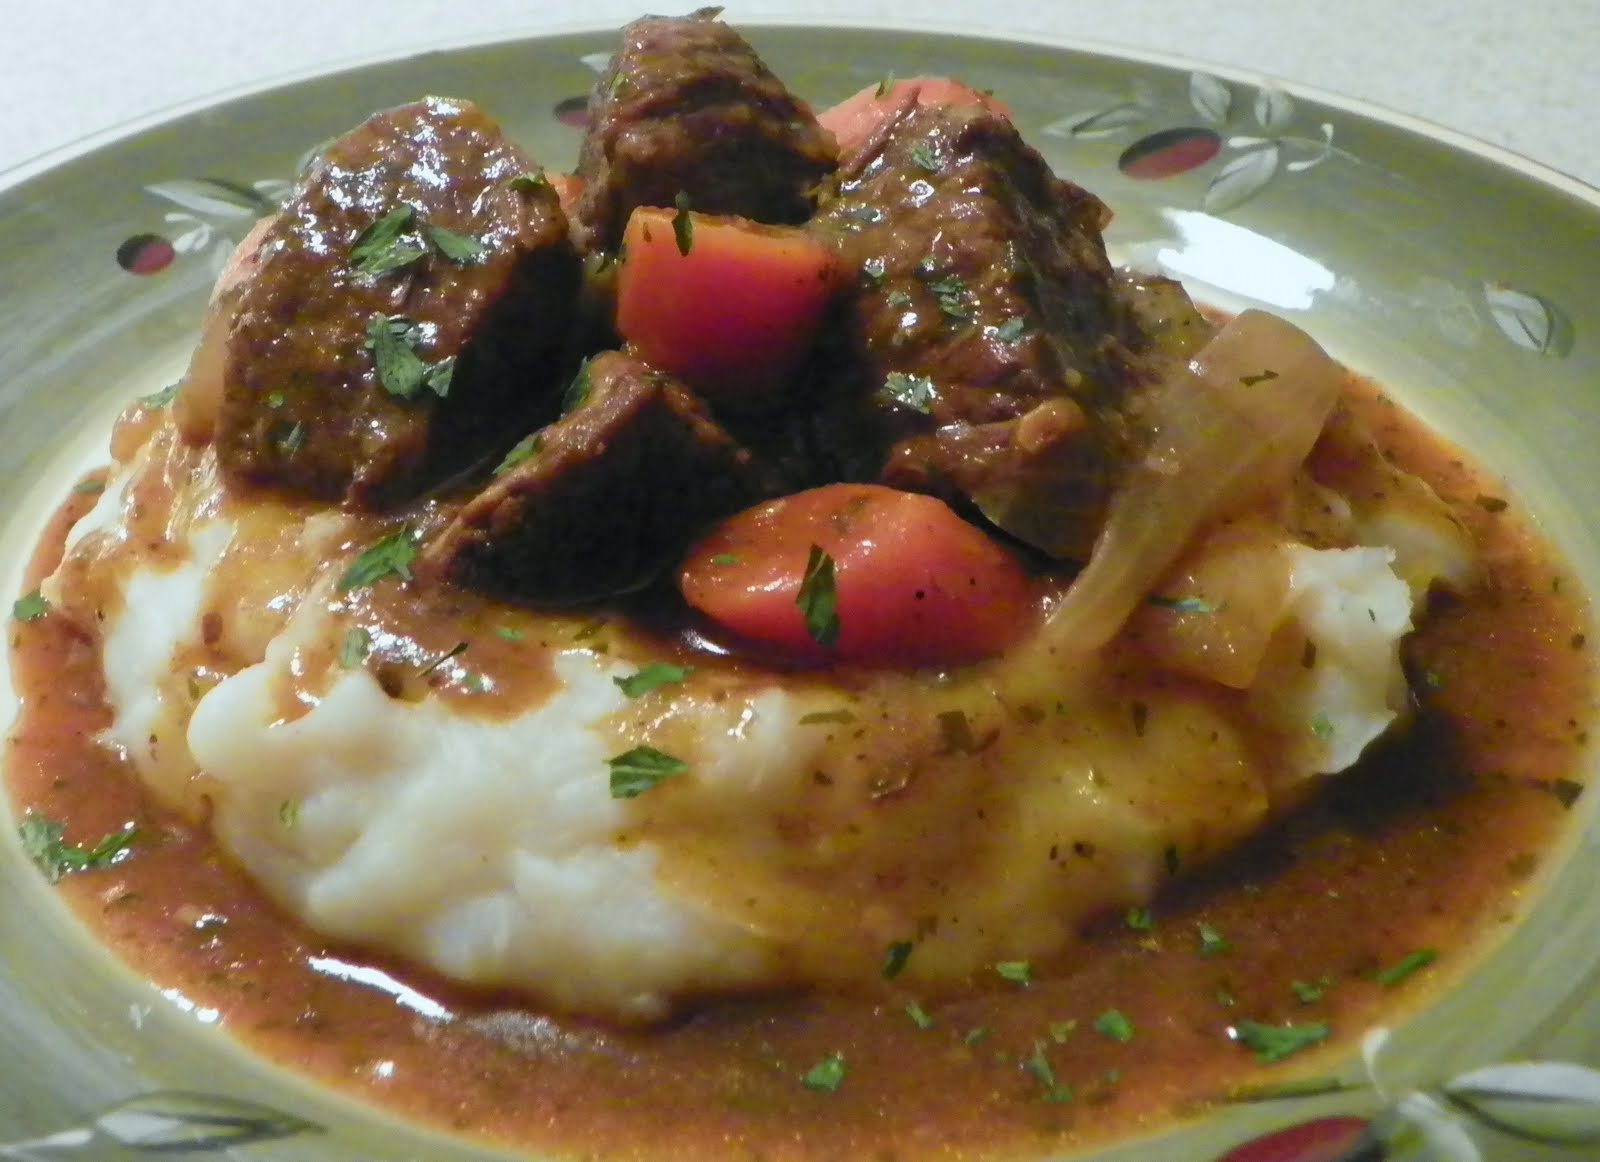 Ina Garten Beef Stew Gorgeous What's For Dinner Tonight Ladies *recipes* Beef Bourguignon Design Ideas